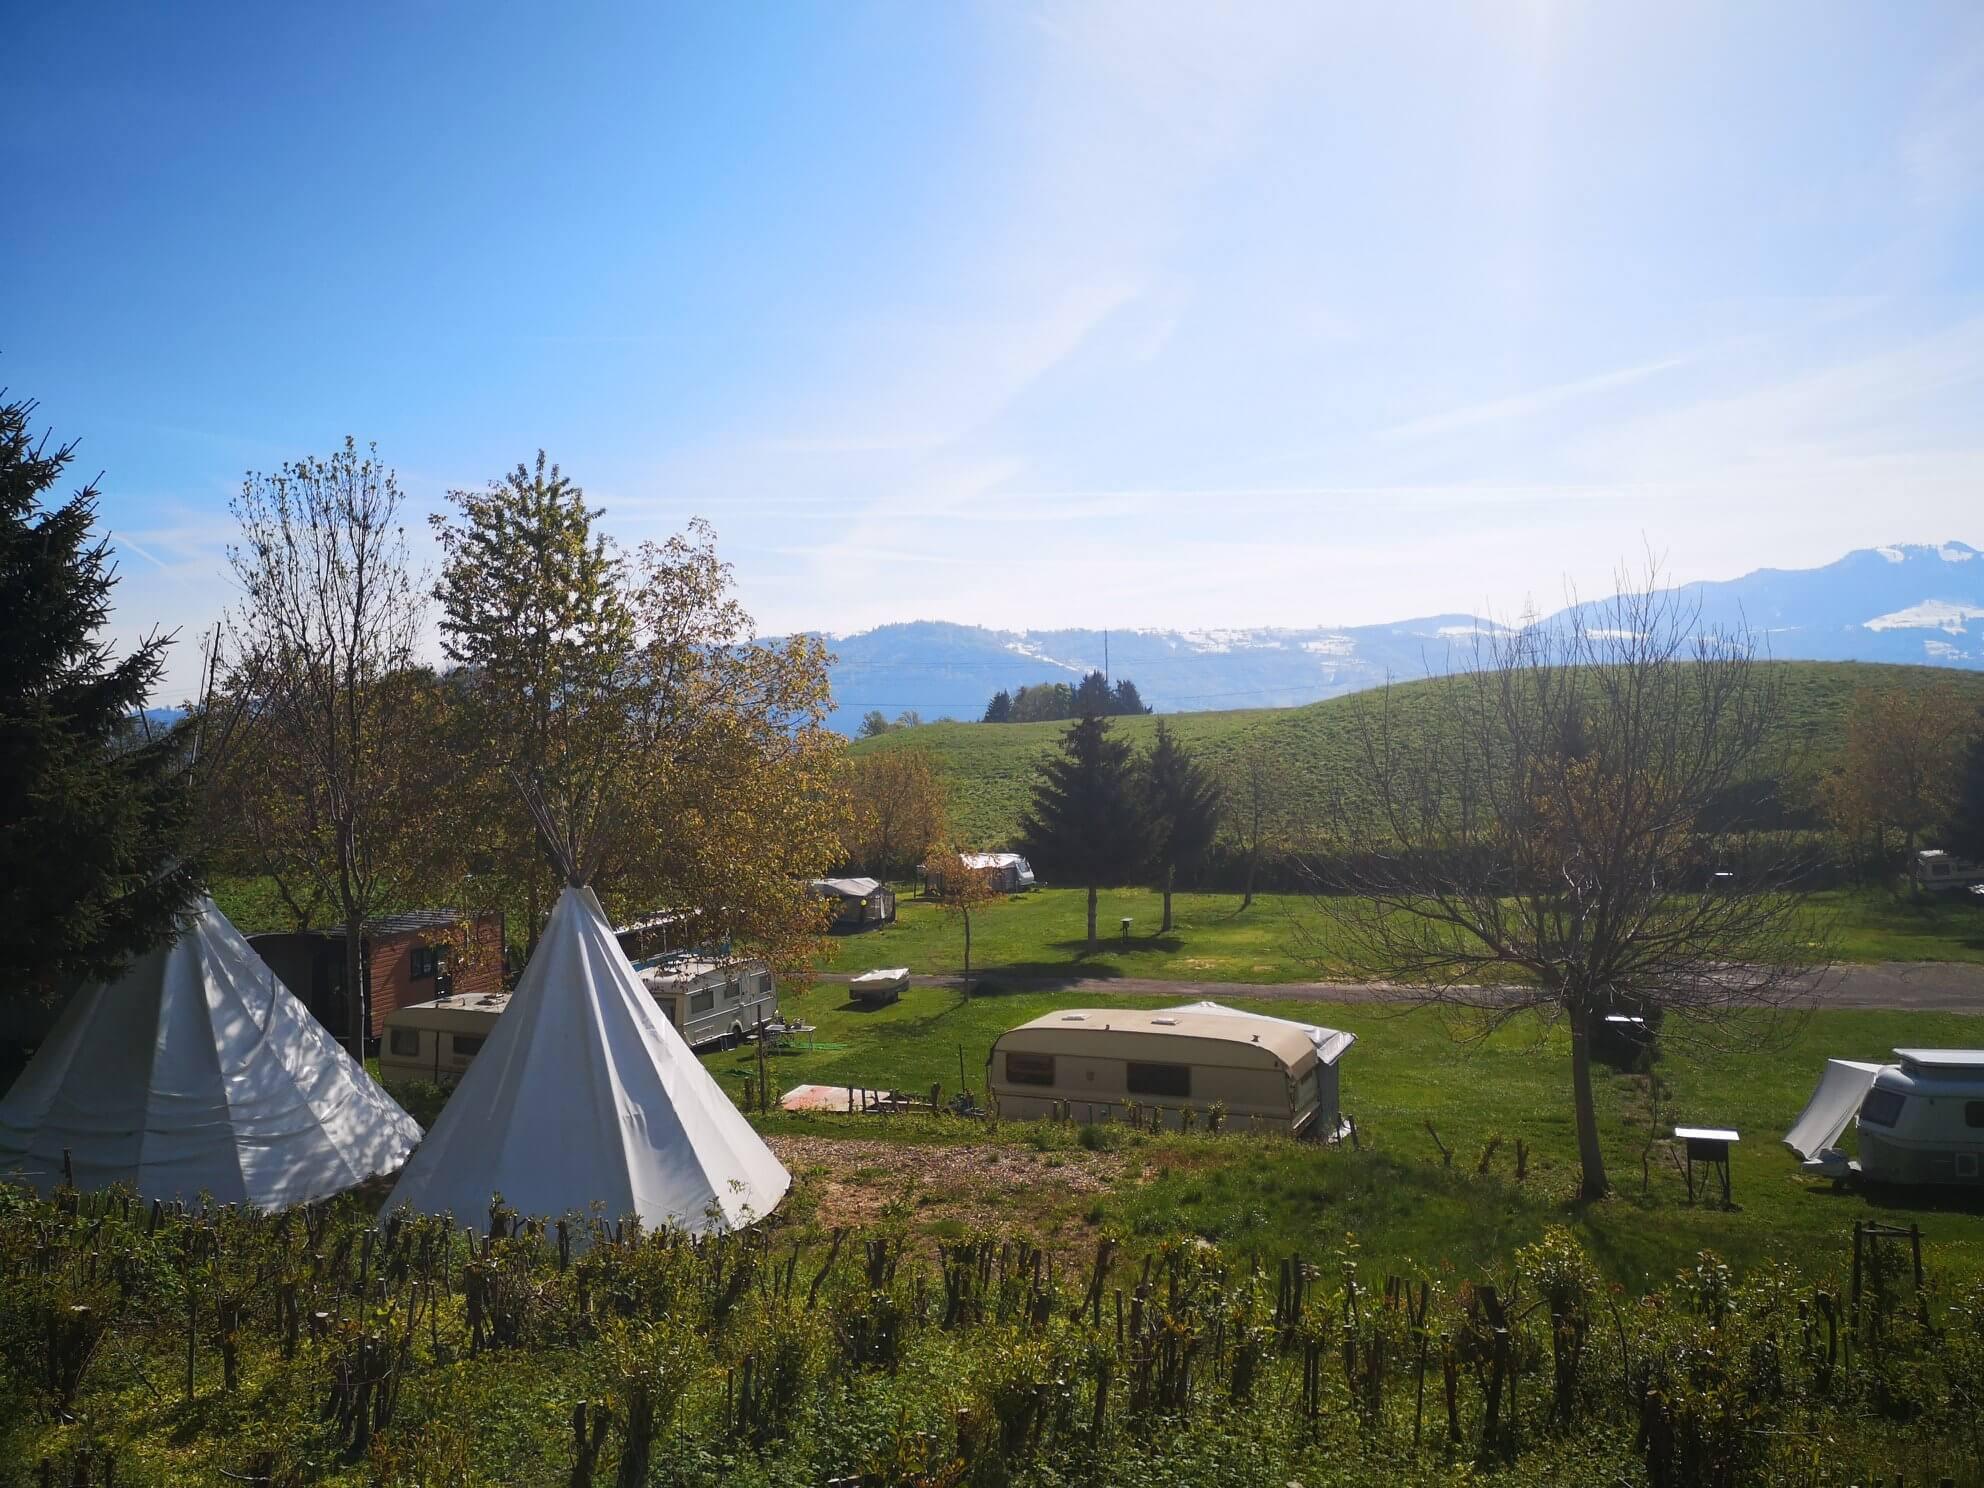 Periodische_Elektrokontrolle_Camping_Gerbe_Meierskappel